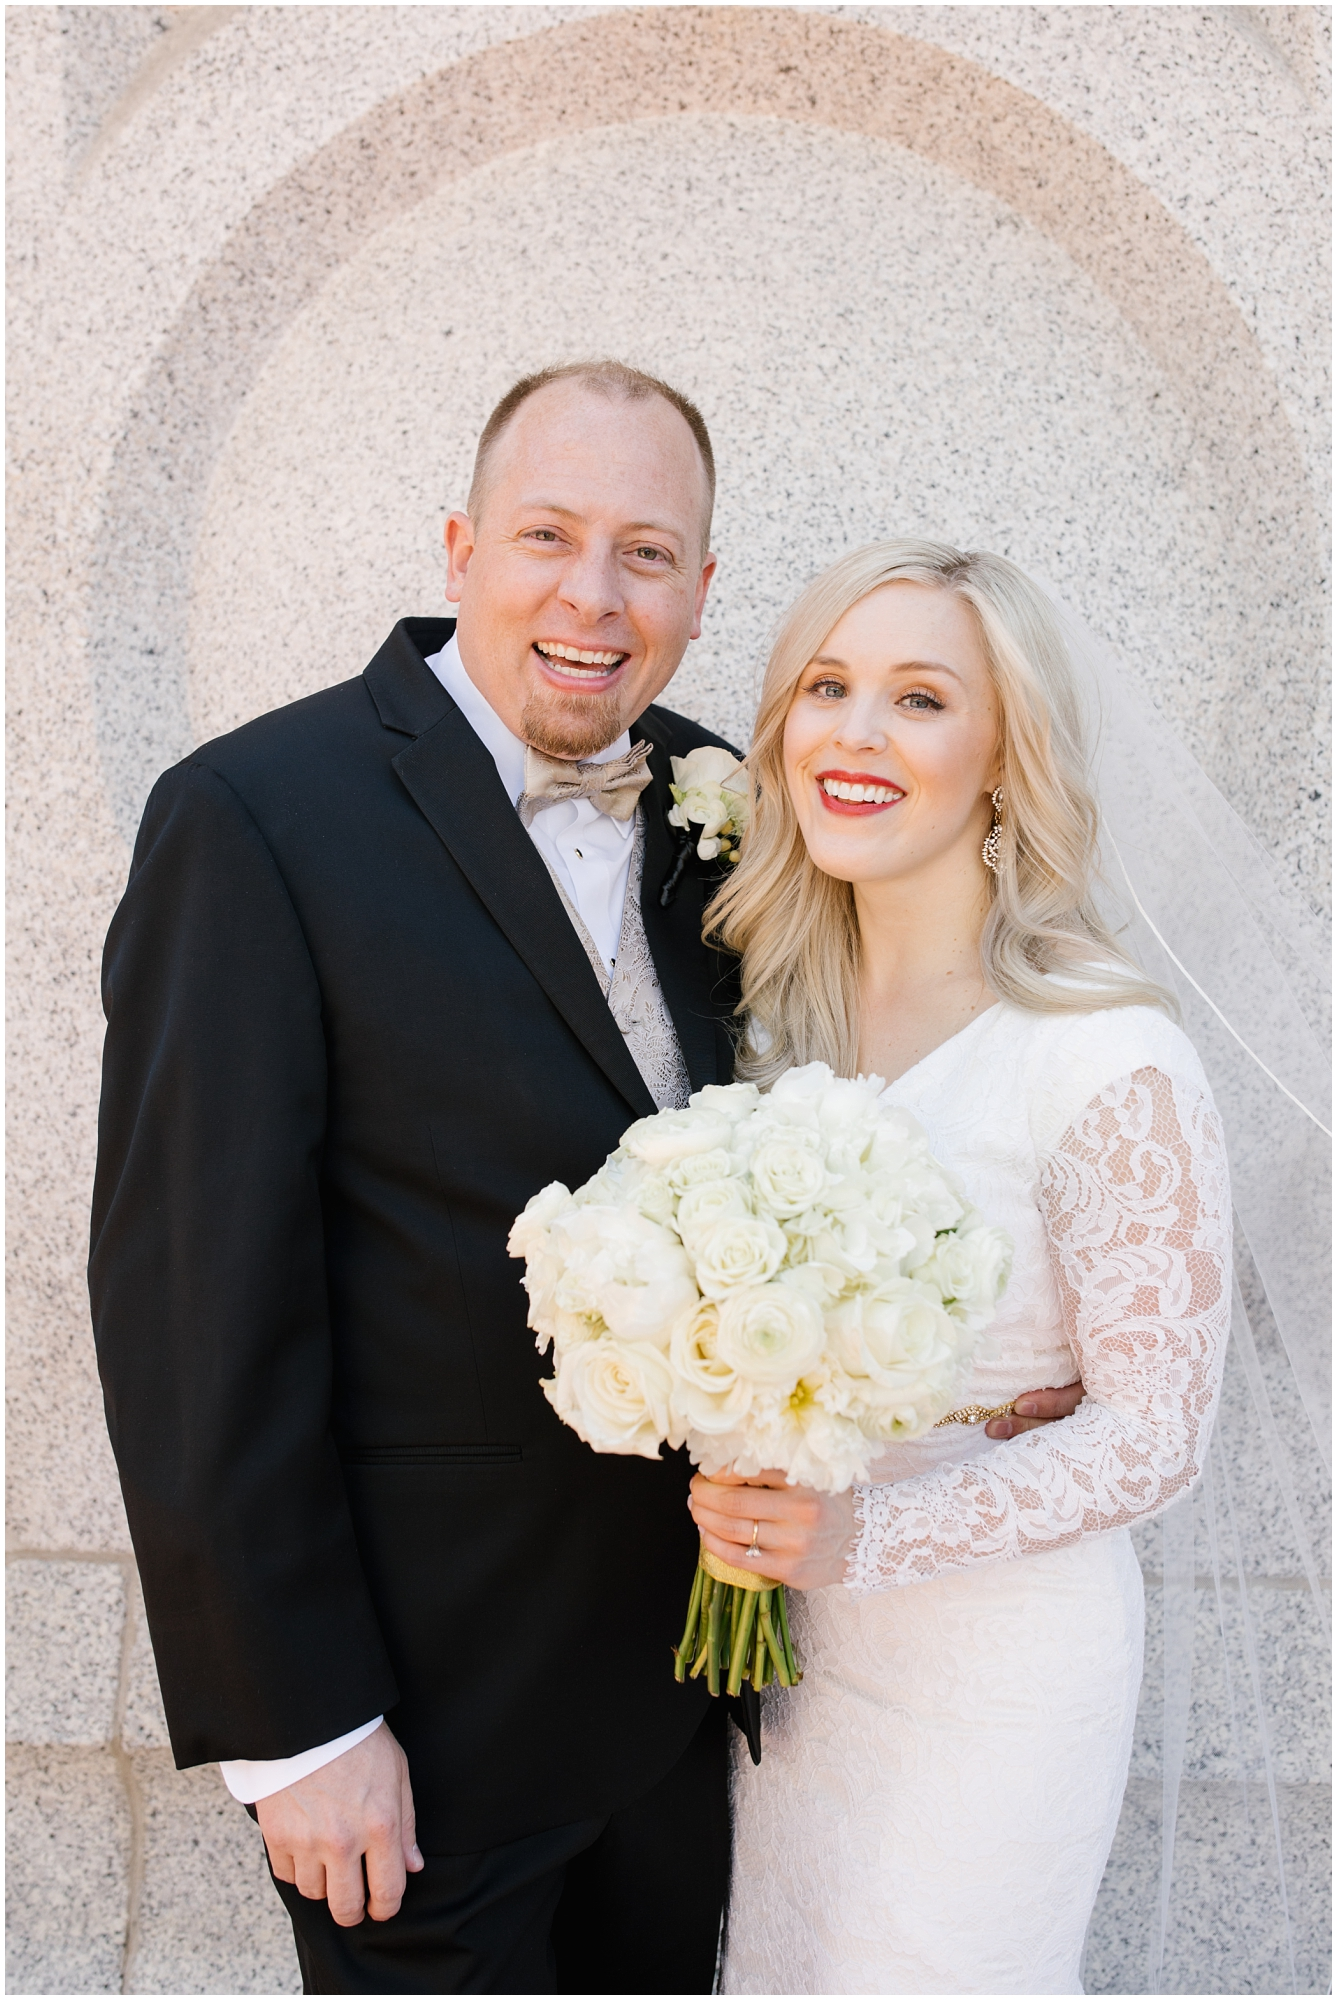 CherylandTyler-165_Lizzie-B-Imagery-Utah-Wedding-Photographer-Park-City-Salt-Lake-City-Temple-Wells-Fargo-Building.jpg